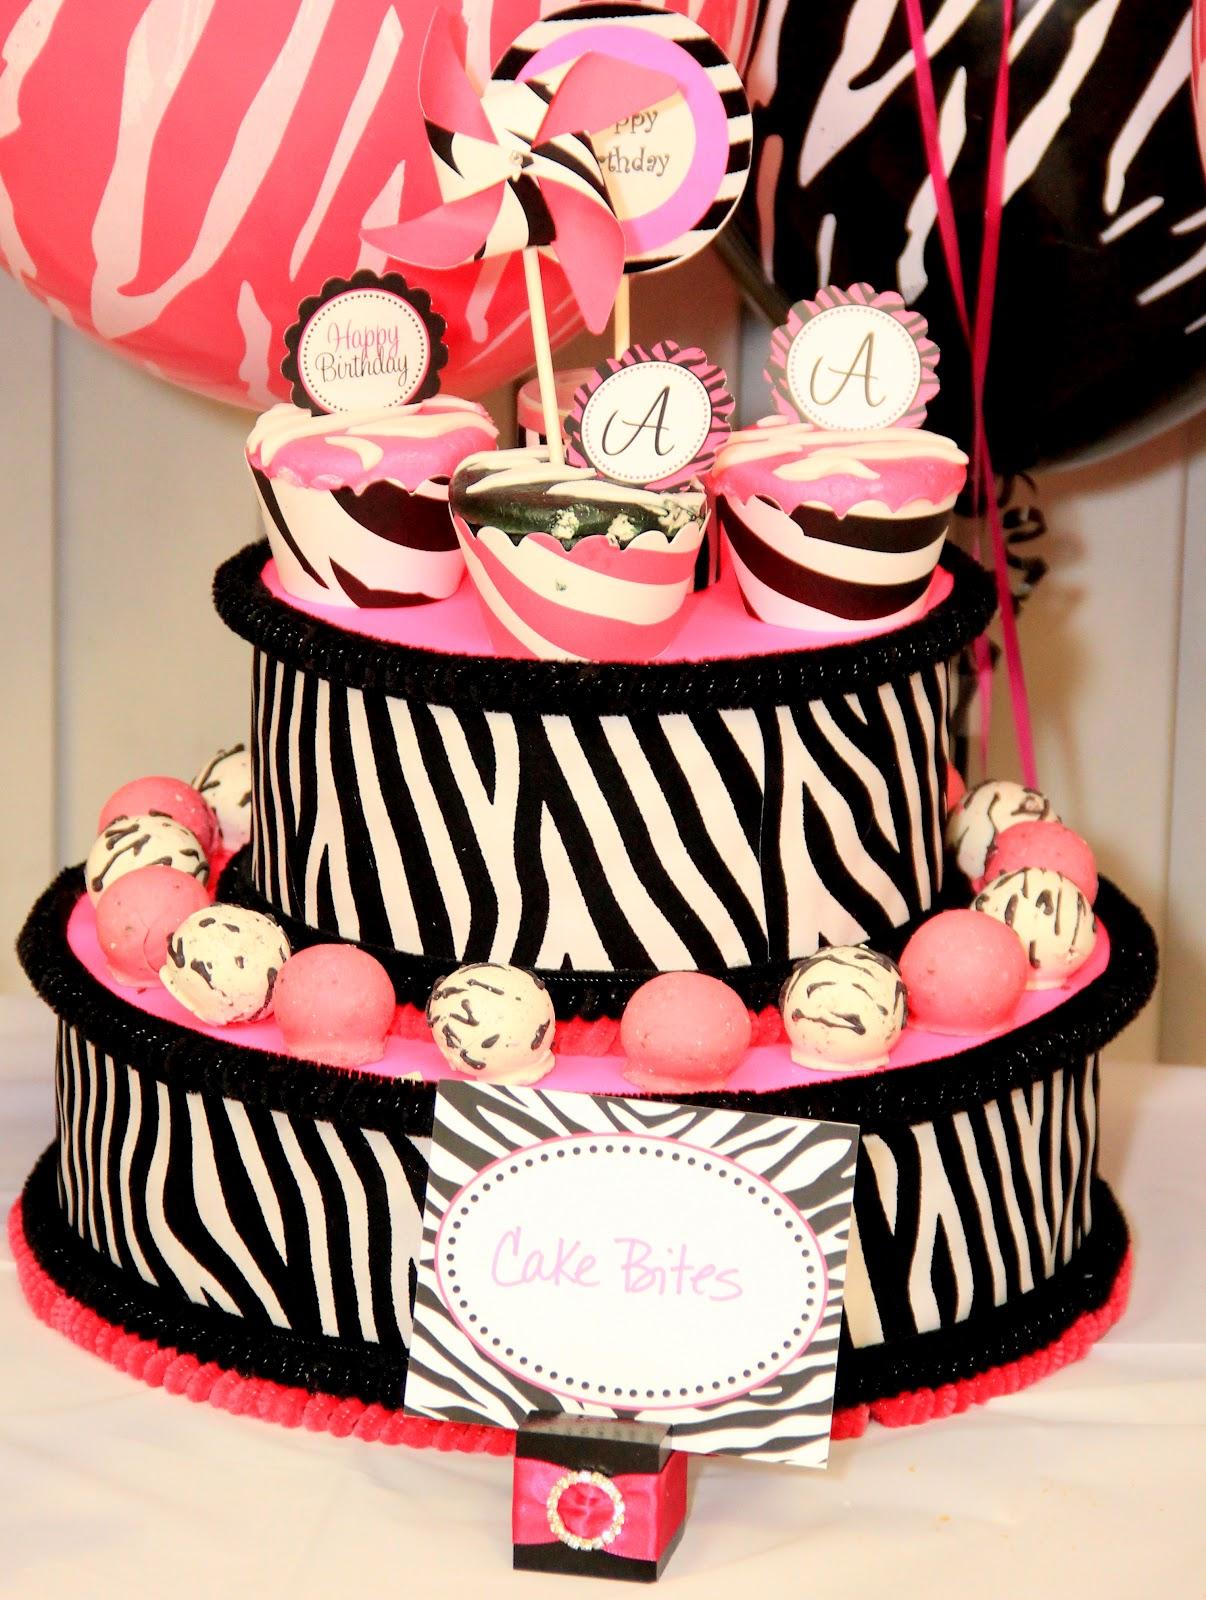 Cake Art Affair : the momAHOLIC {diaries}: An Oh-So-Glamorous Birthday Affair